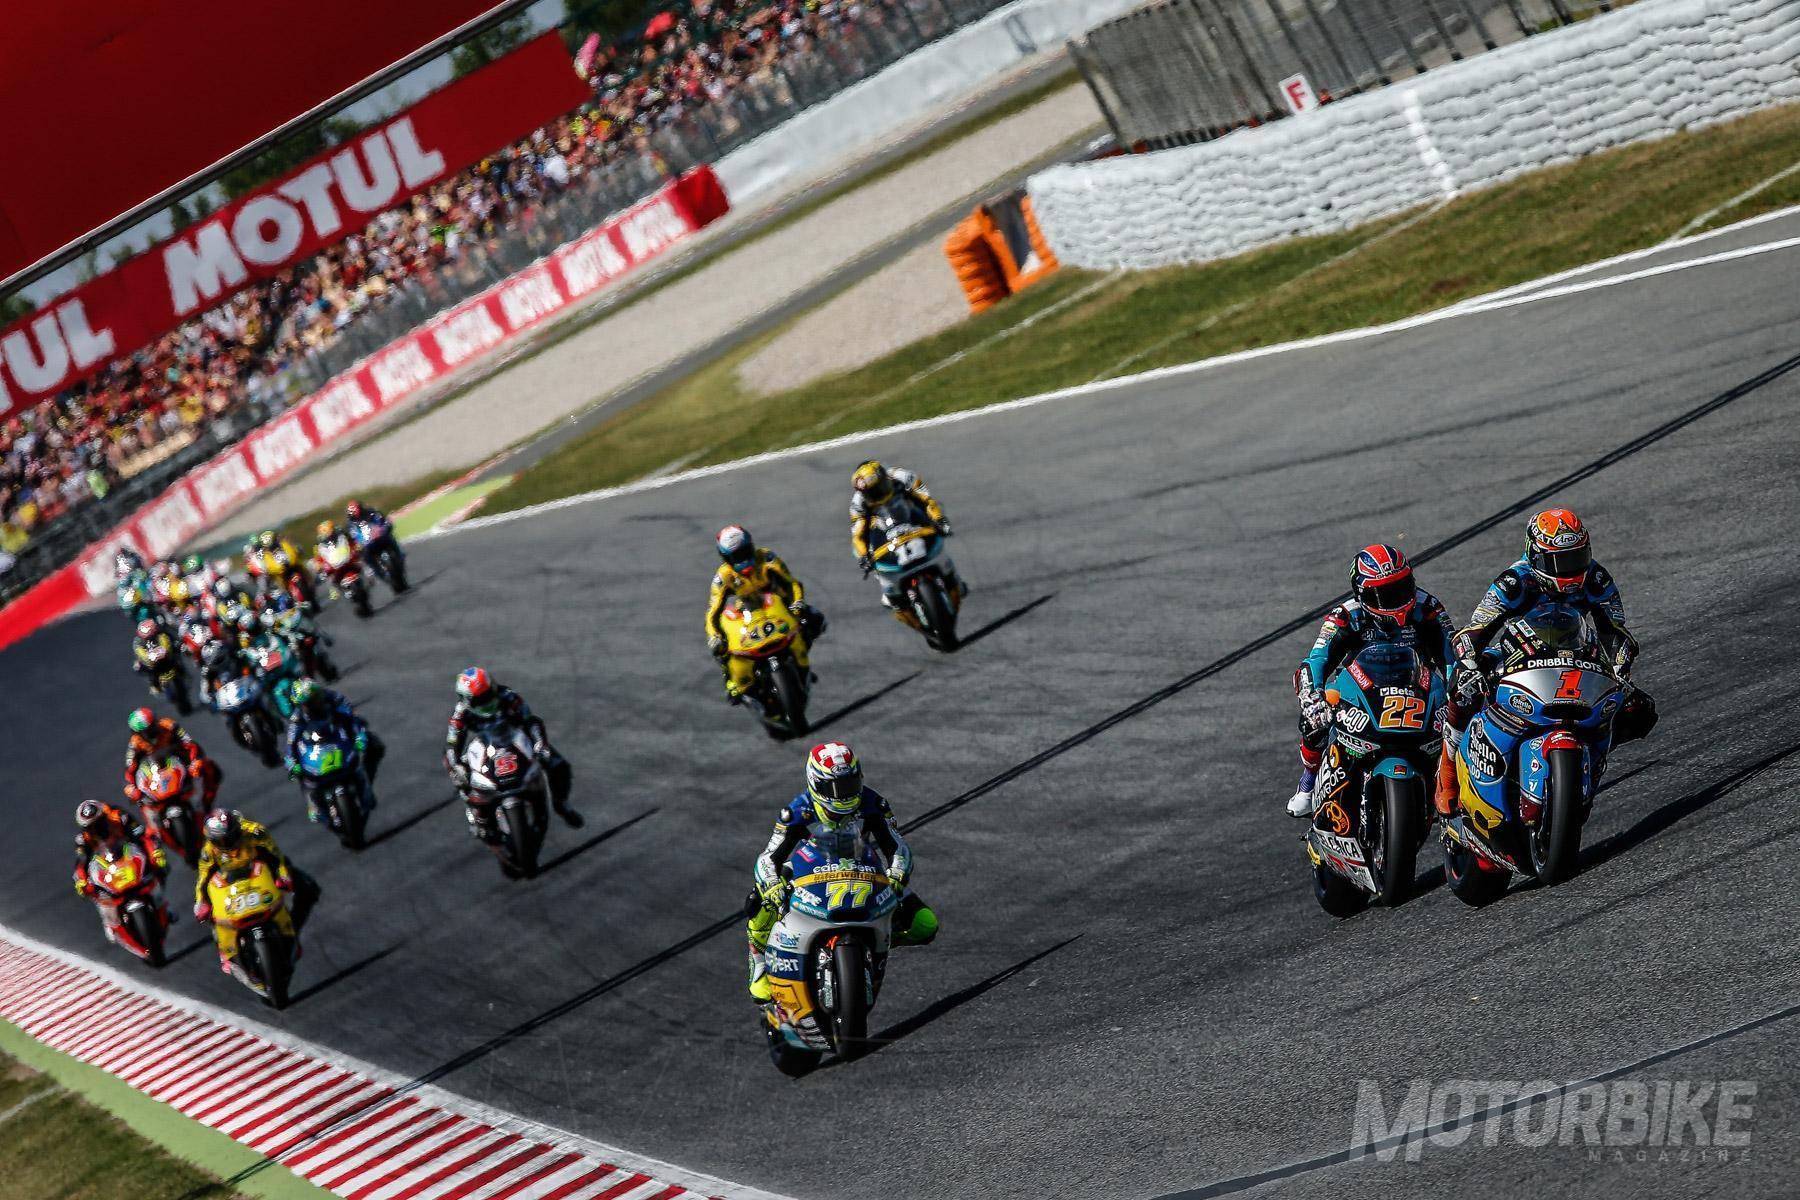 Moto2 Cataluña 2015 - Motorbike Magazine